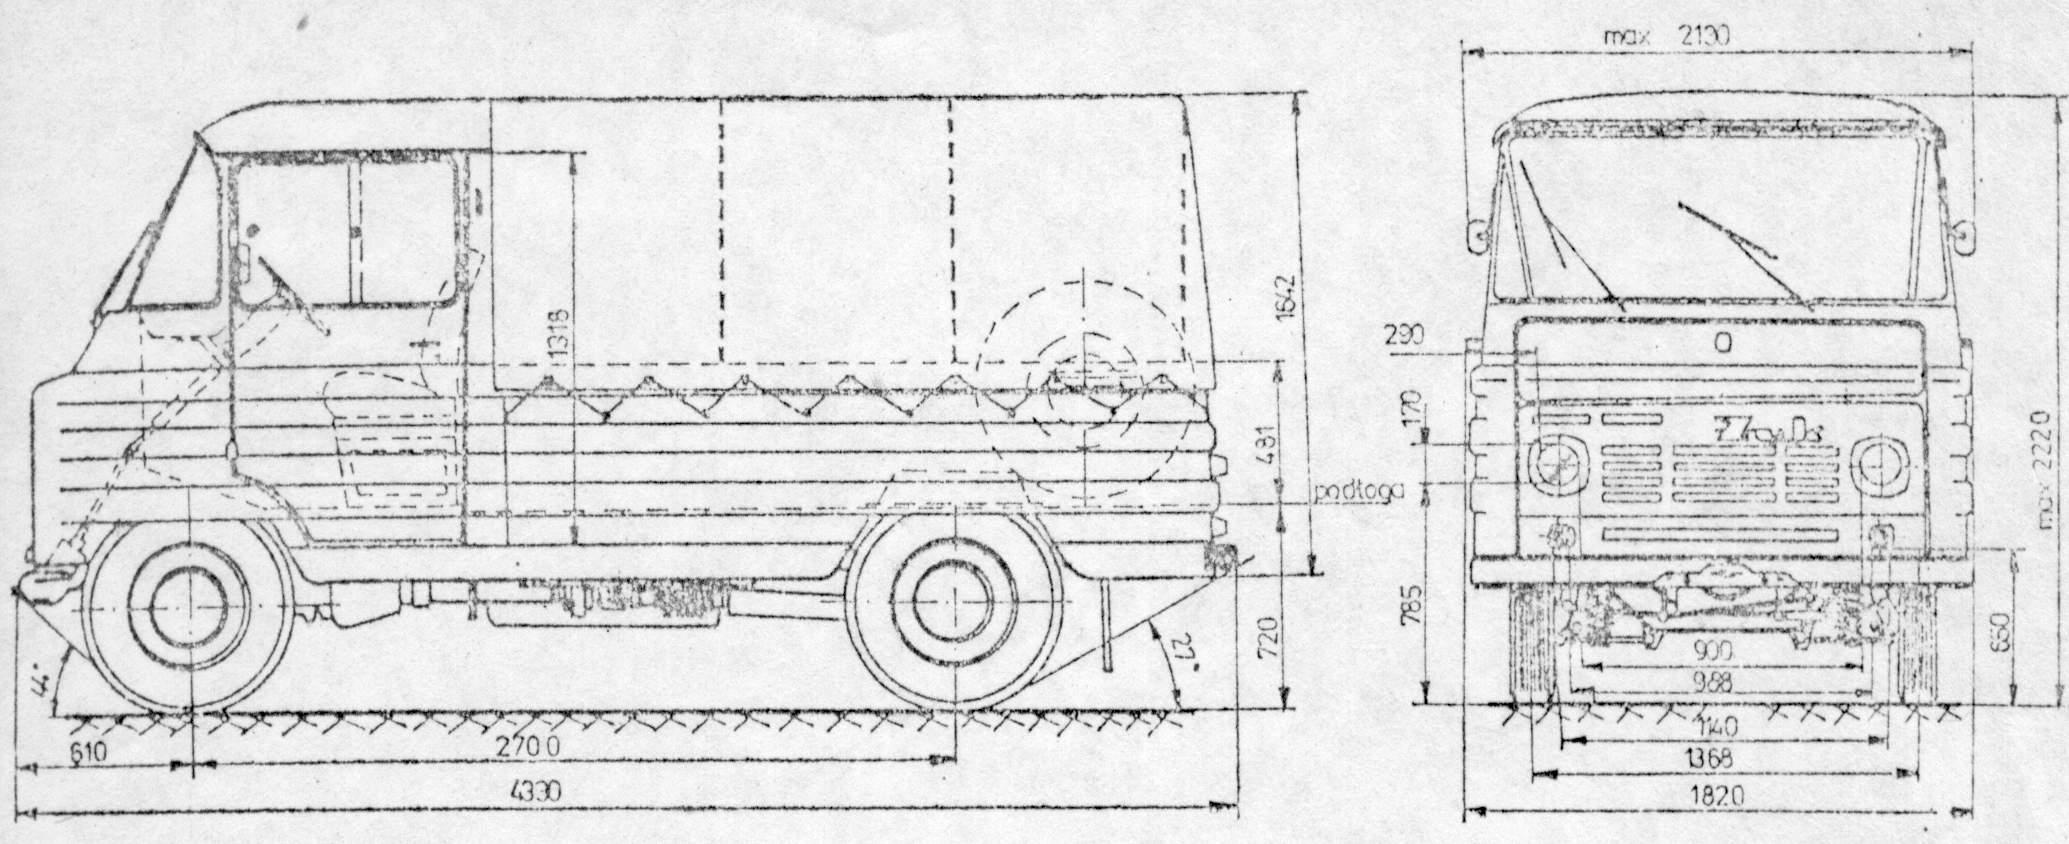 FSC Zuk blueprint